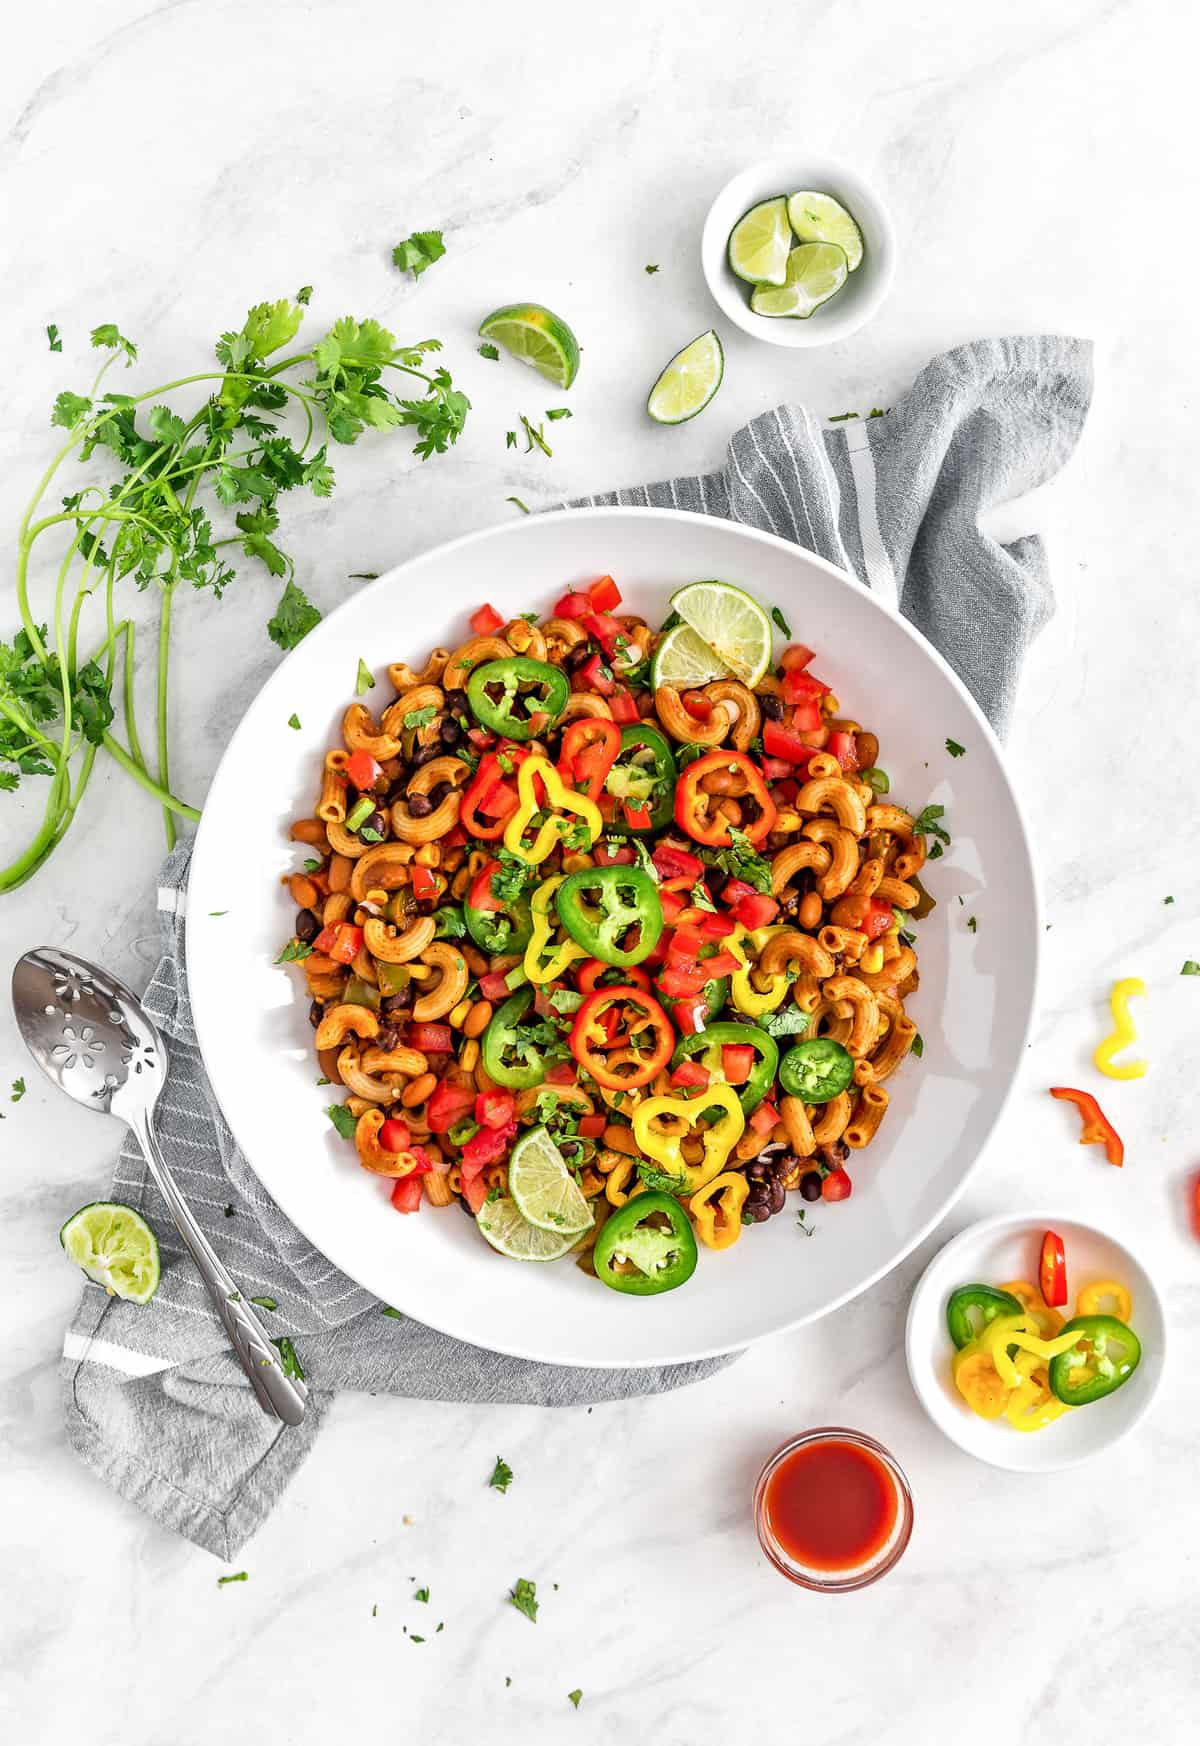 Tex-Mex Chili Mac, Vegan chili mac, vegan dinner, chili, mac, chili mac, tex-mex, southwestern, plant based dinner, plant based, vegan, vegetarian, whole food plant based, gluten free, recipe, wfpb, healthy, healthy vegan, oil free, no refined sugar, no oil, refined sugar free, dairy free, dairy, dinner, lunch, healthy recipe, vegan meal